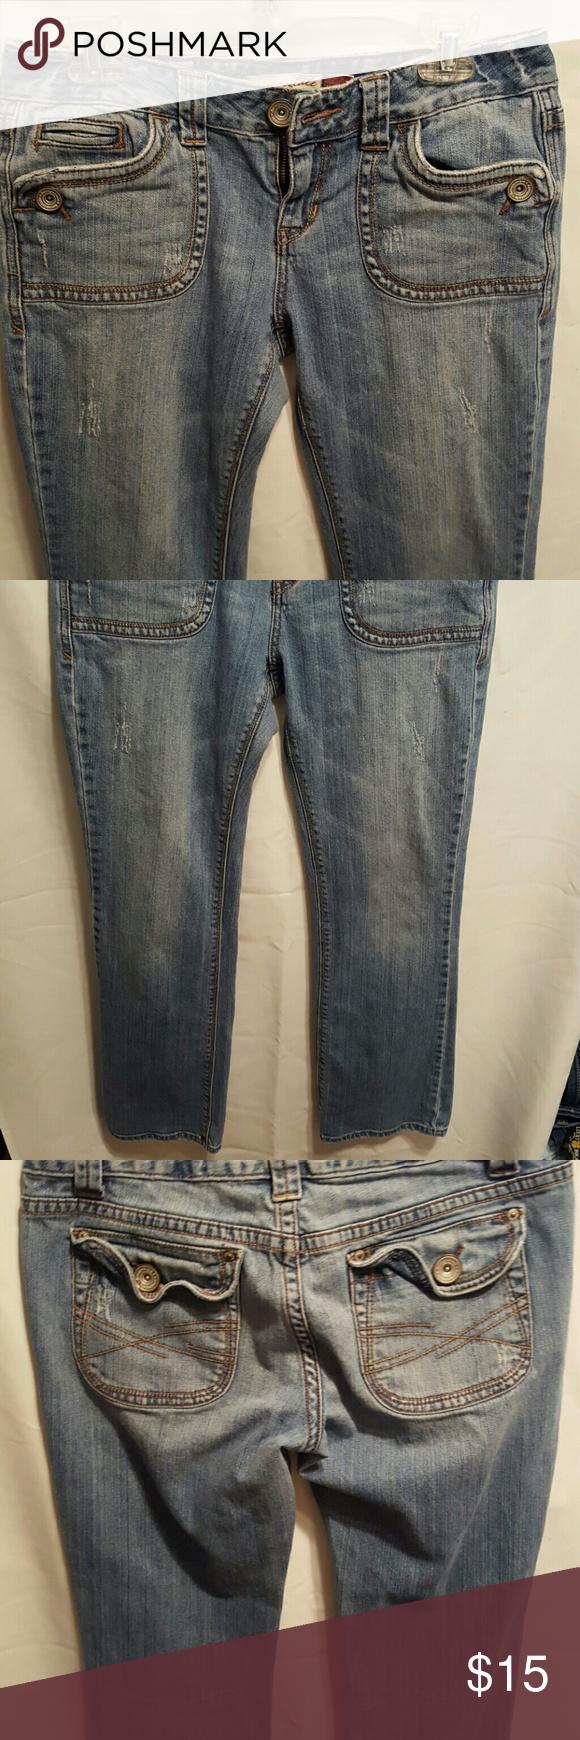 Aeropostale boot cut jeans Jeans boots cut regular Aeropostale Pants Boot Cut & Flare